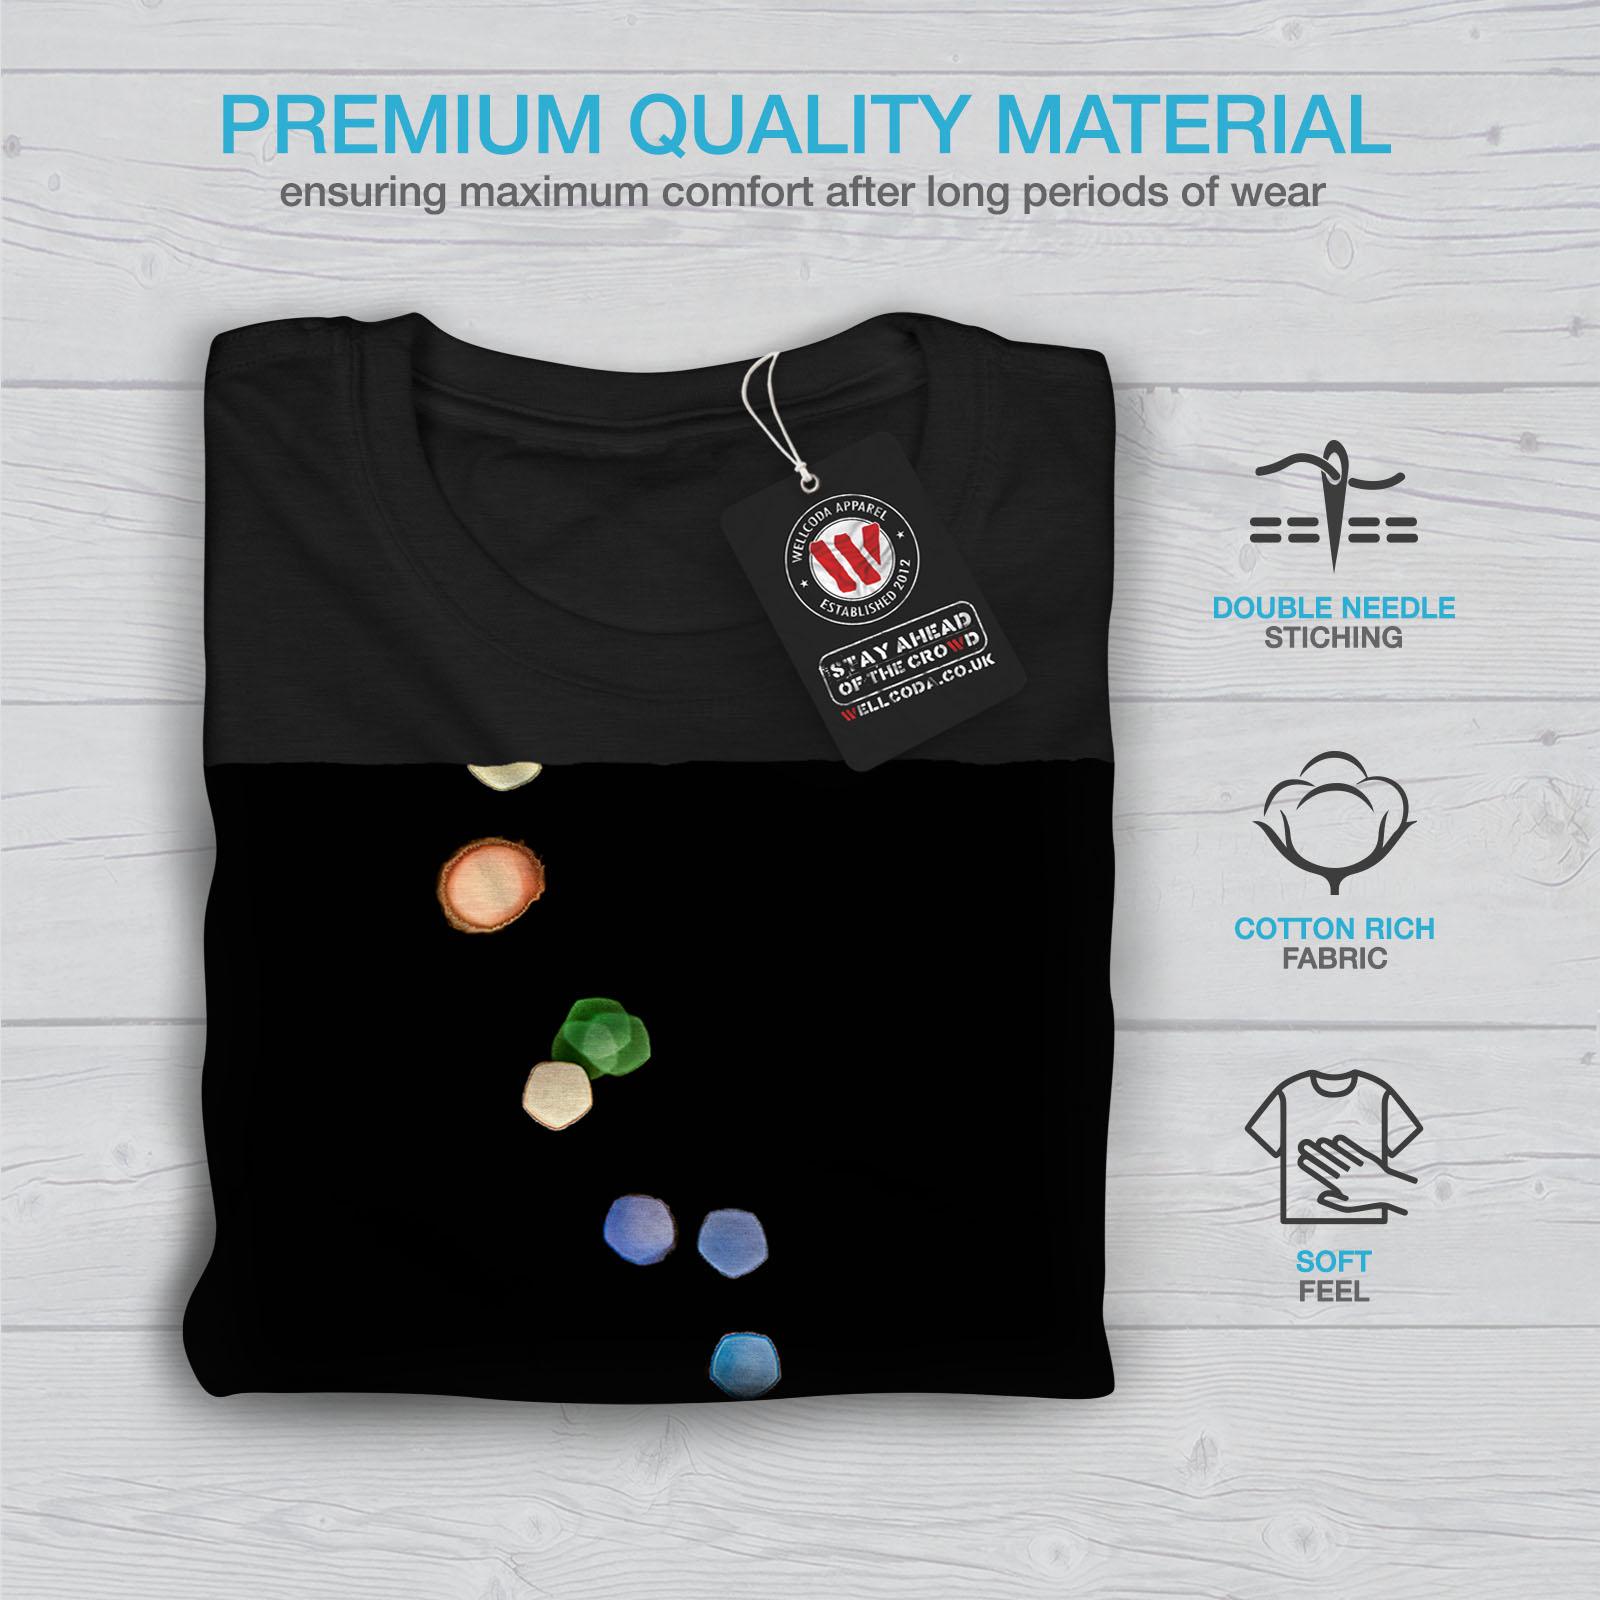 Wellcoda-Tea-Cup-Retro-Old-Mens-T-shirt-Smell-Graphic-Design-Printed-Tee thumbnail 7